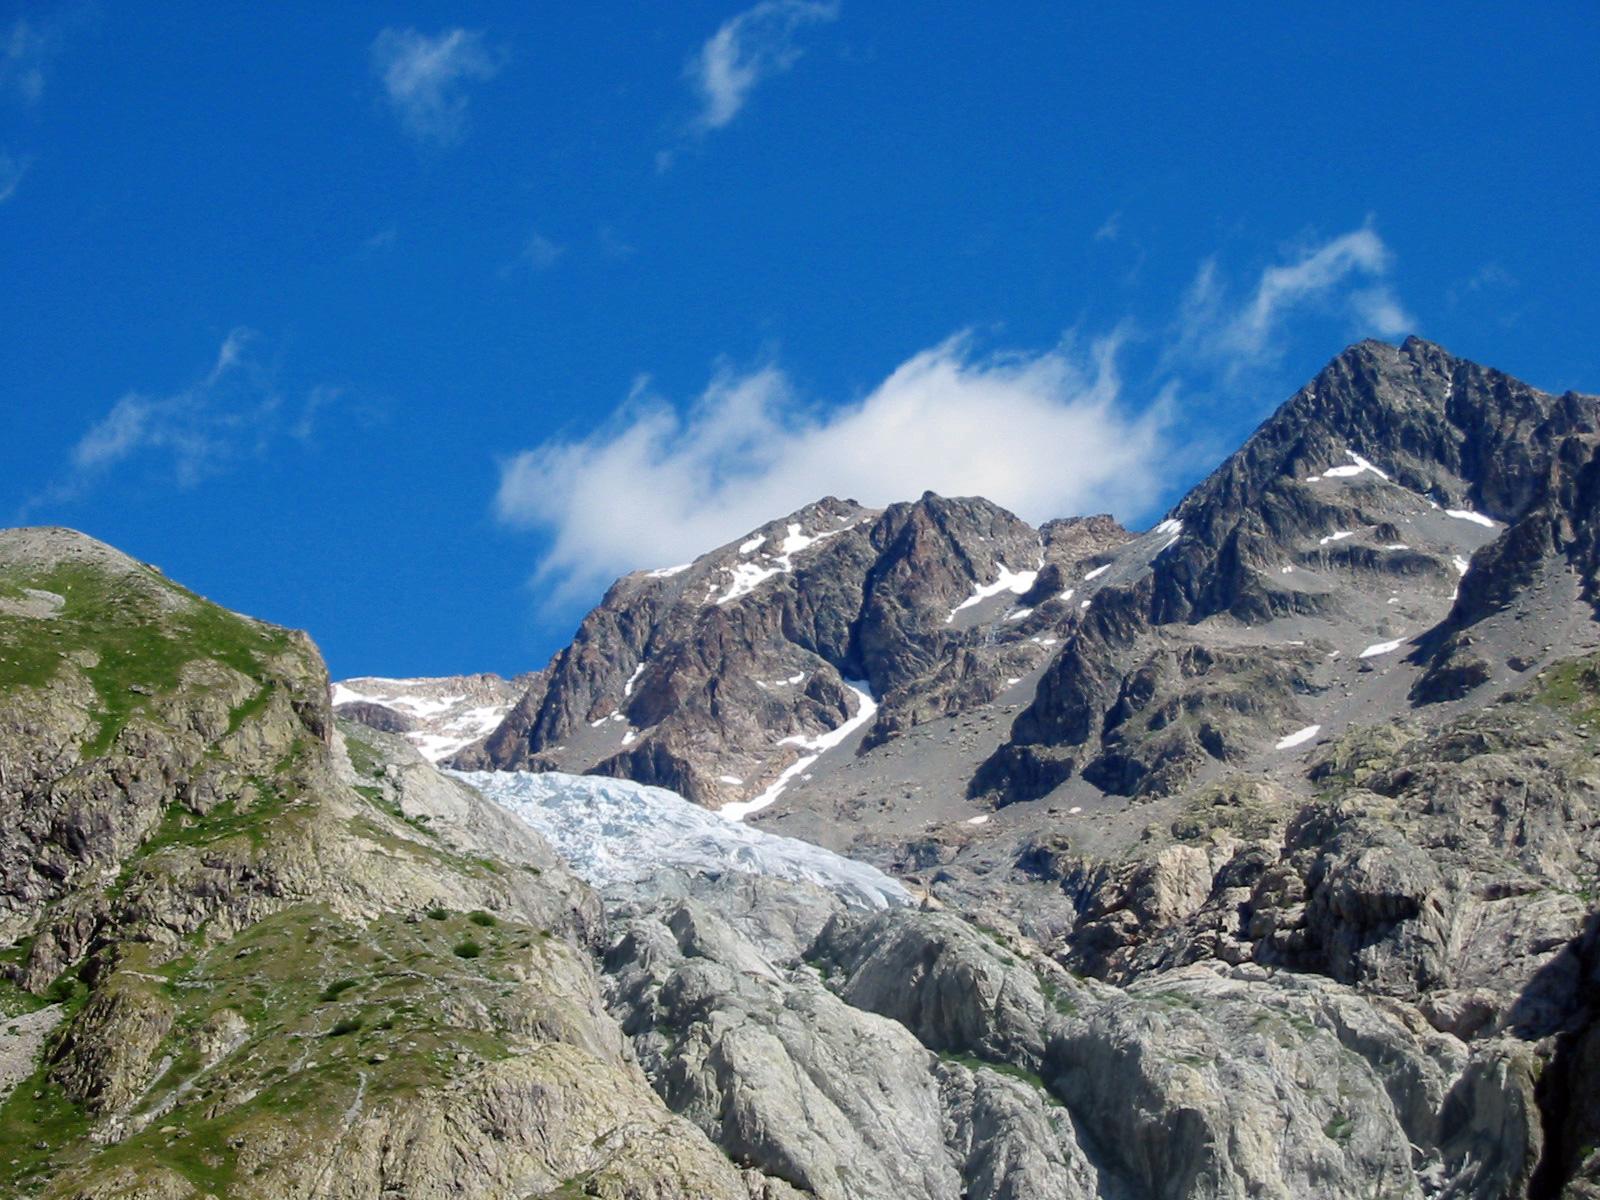 Alpine Glacier. Image Source: Wikimedia Commons.